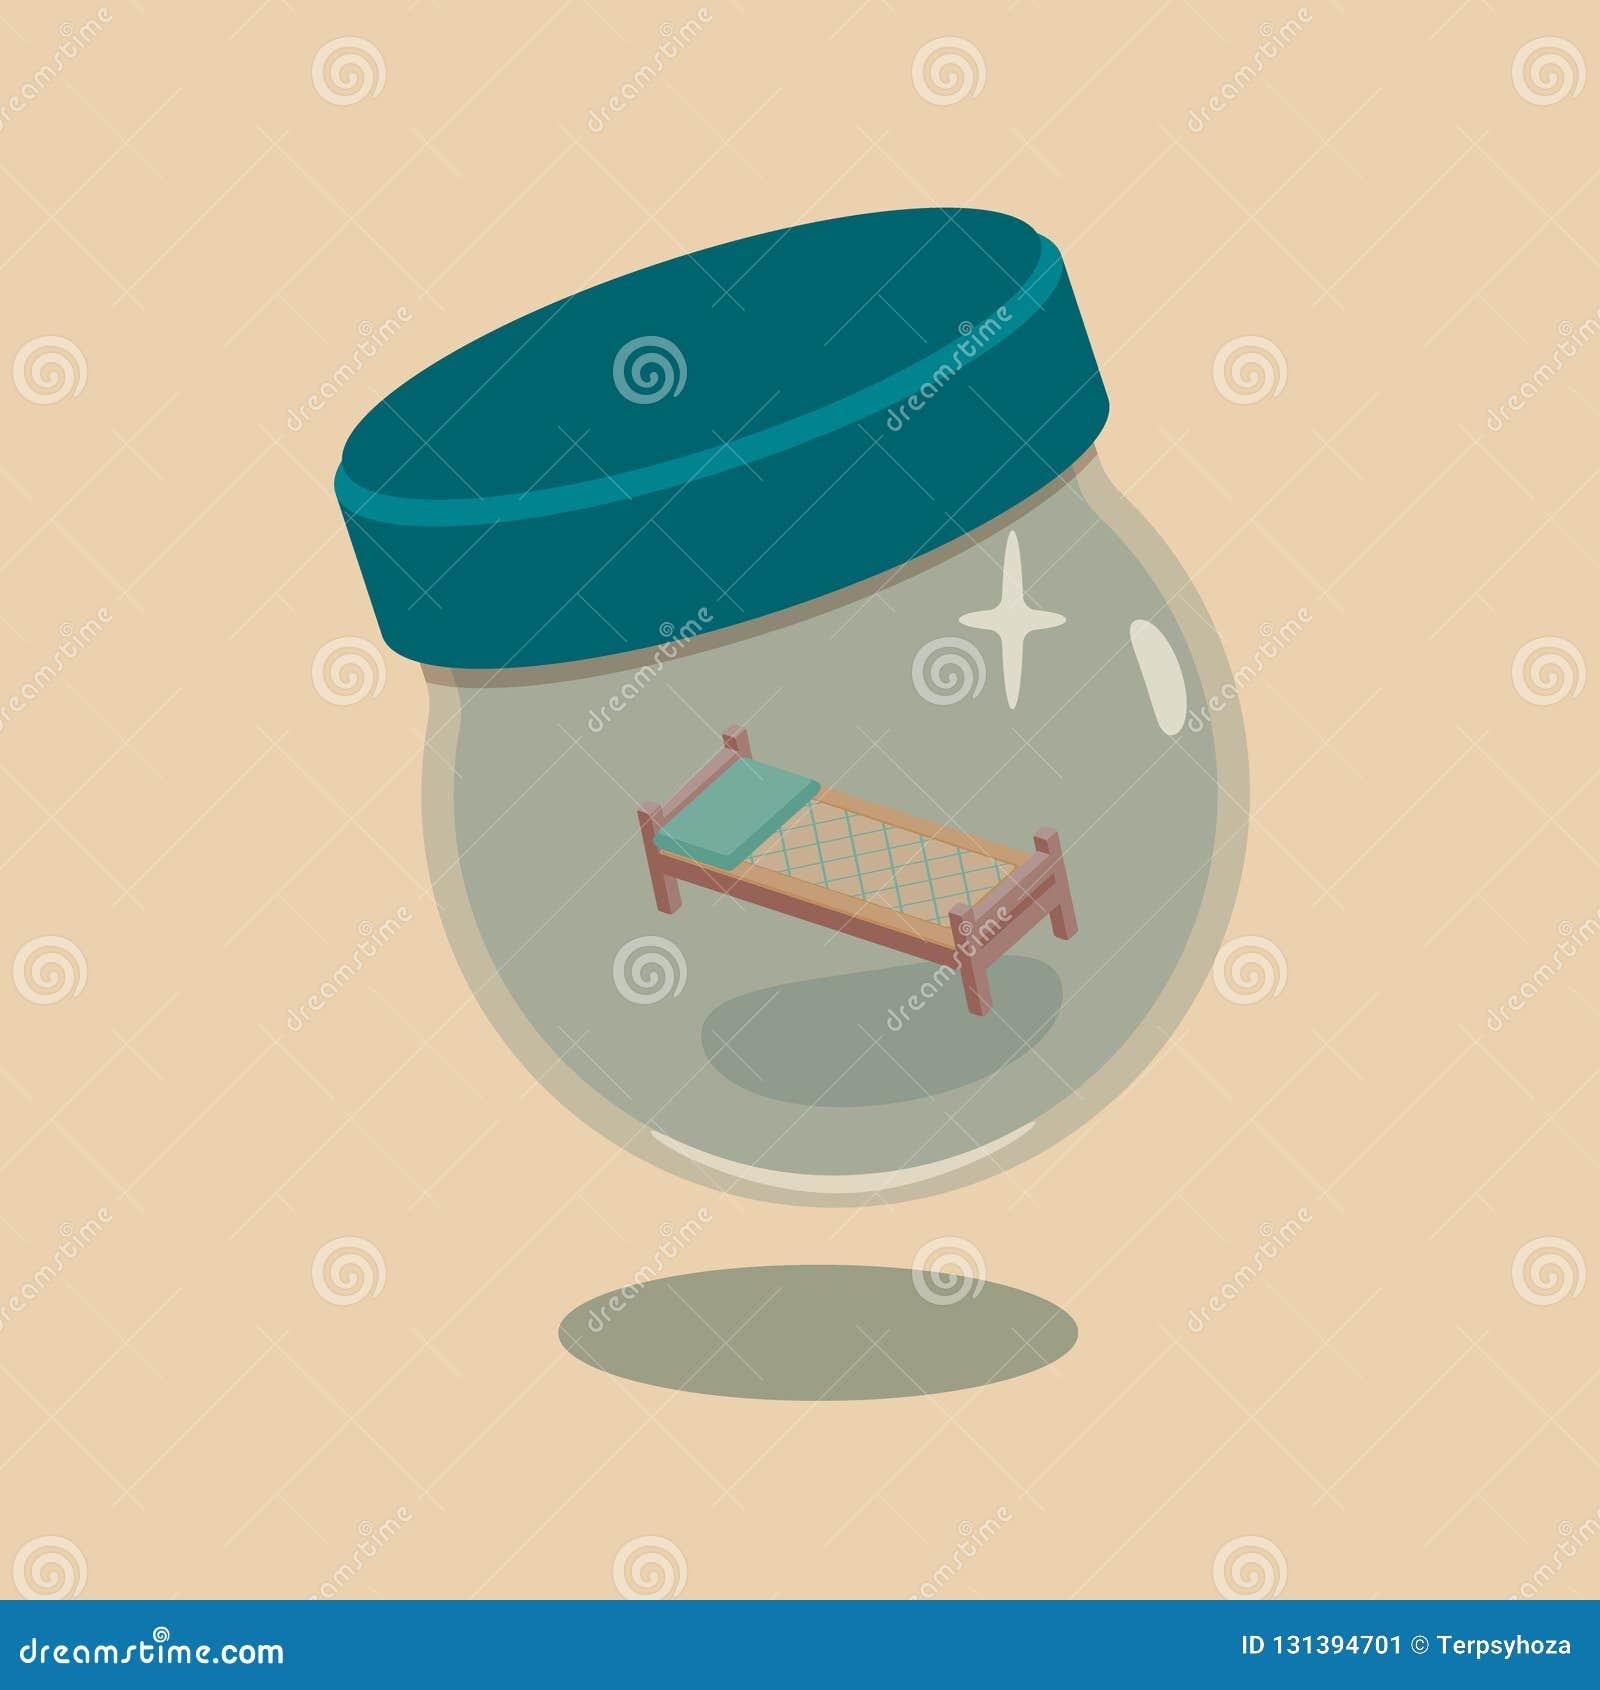 Vector Illustration Of Bed In Vial Stock Vector - Illustration of